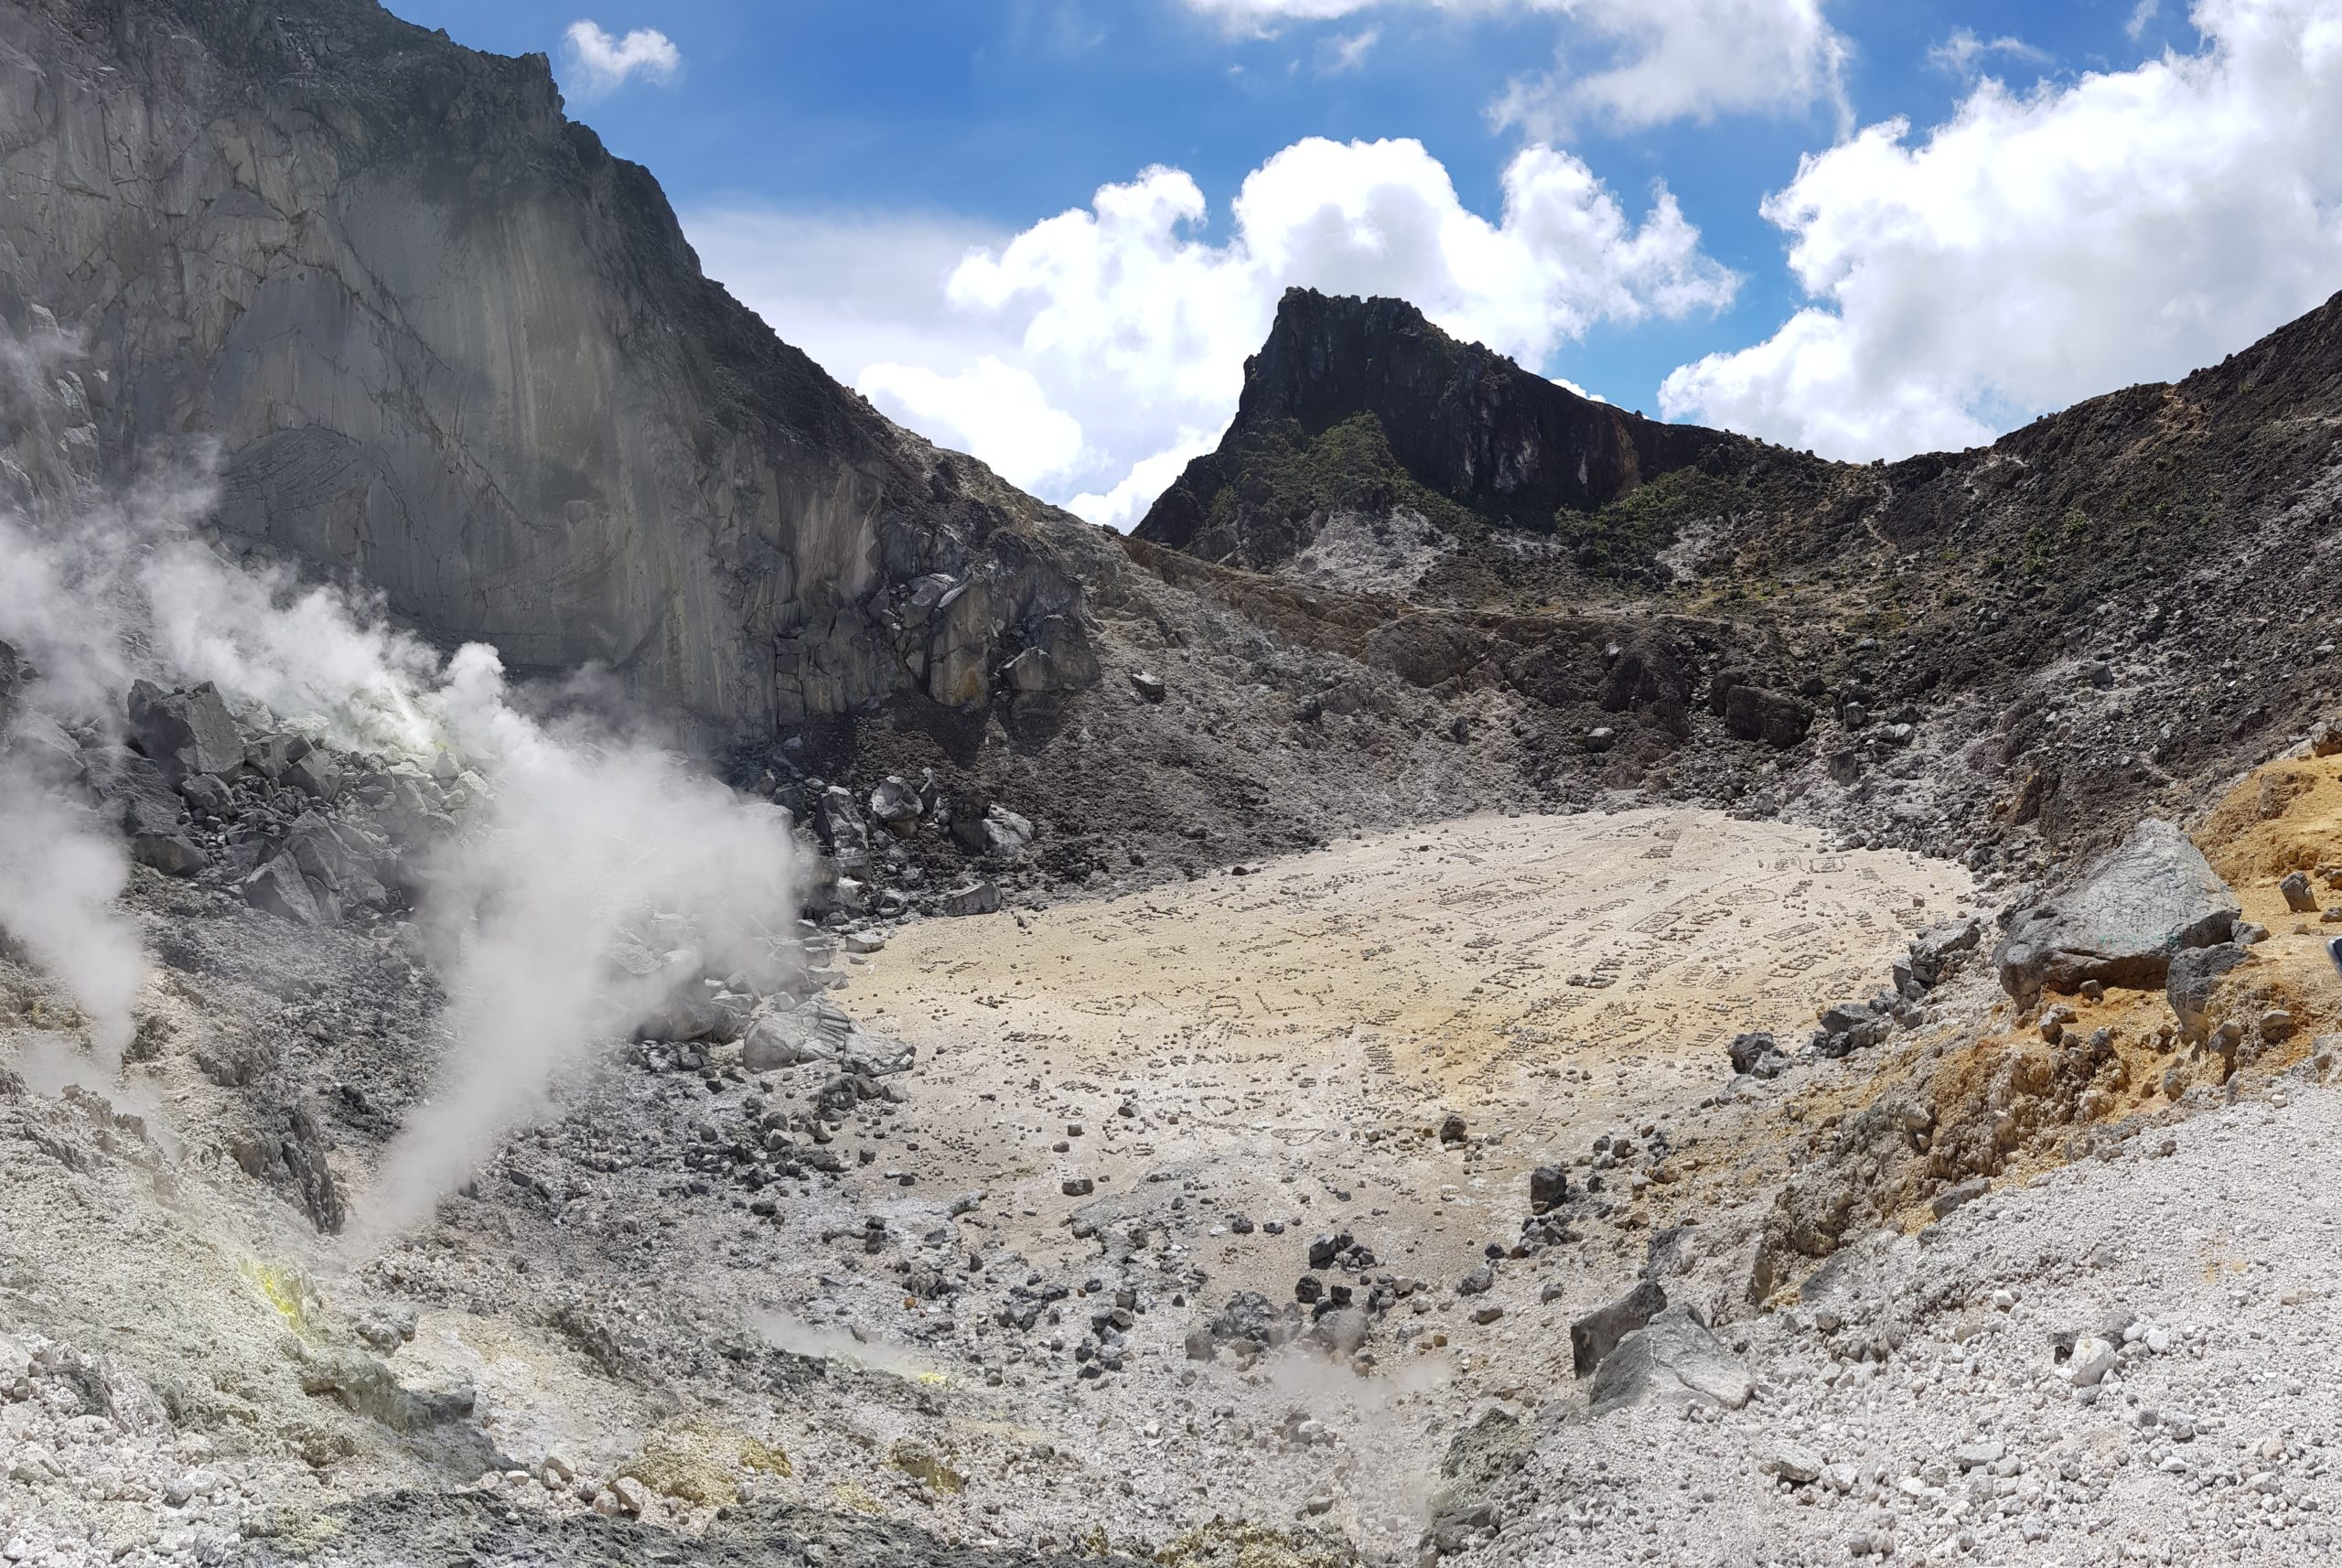 Vulkan-Trekking auf dem Gunung Sibayak